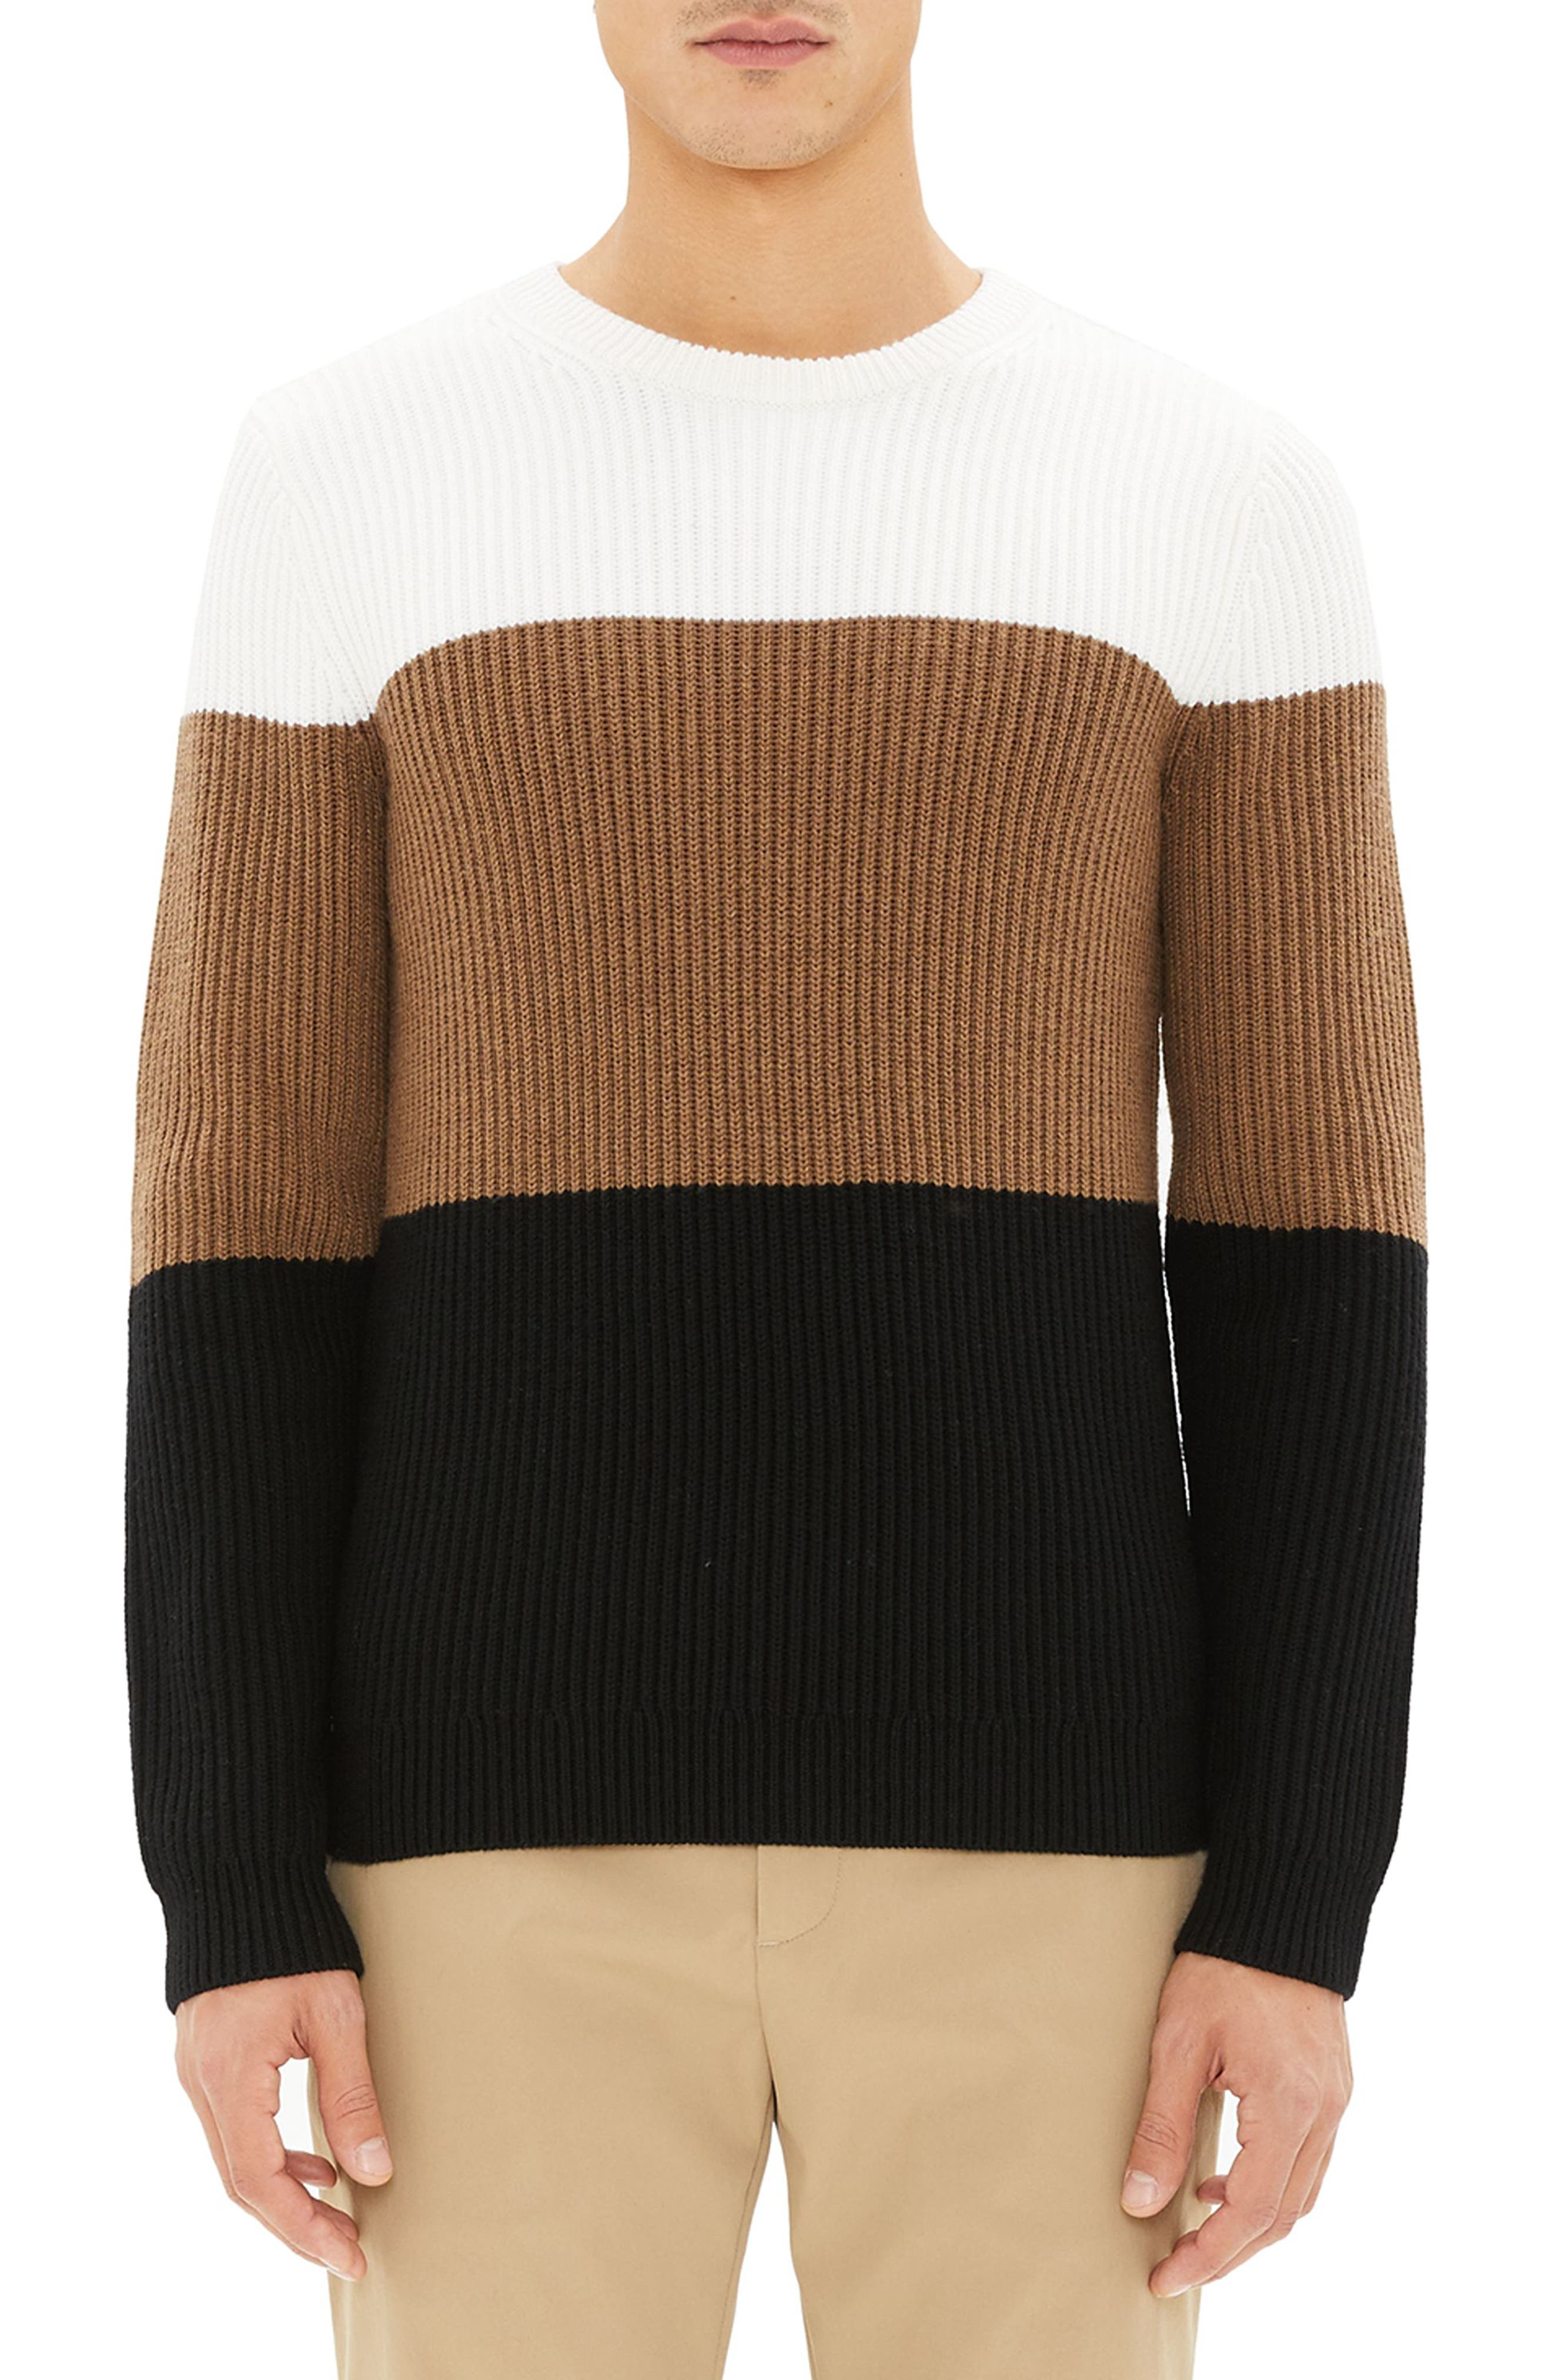 Theory Romman Colorblock Merino Wool Sweater, White